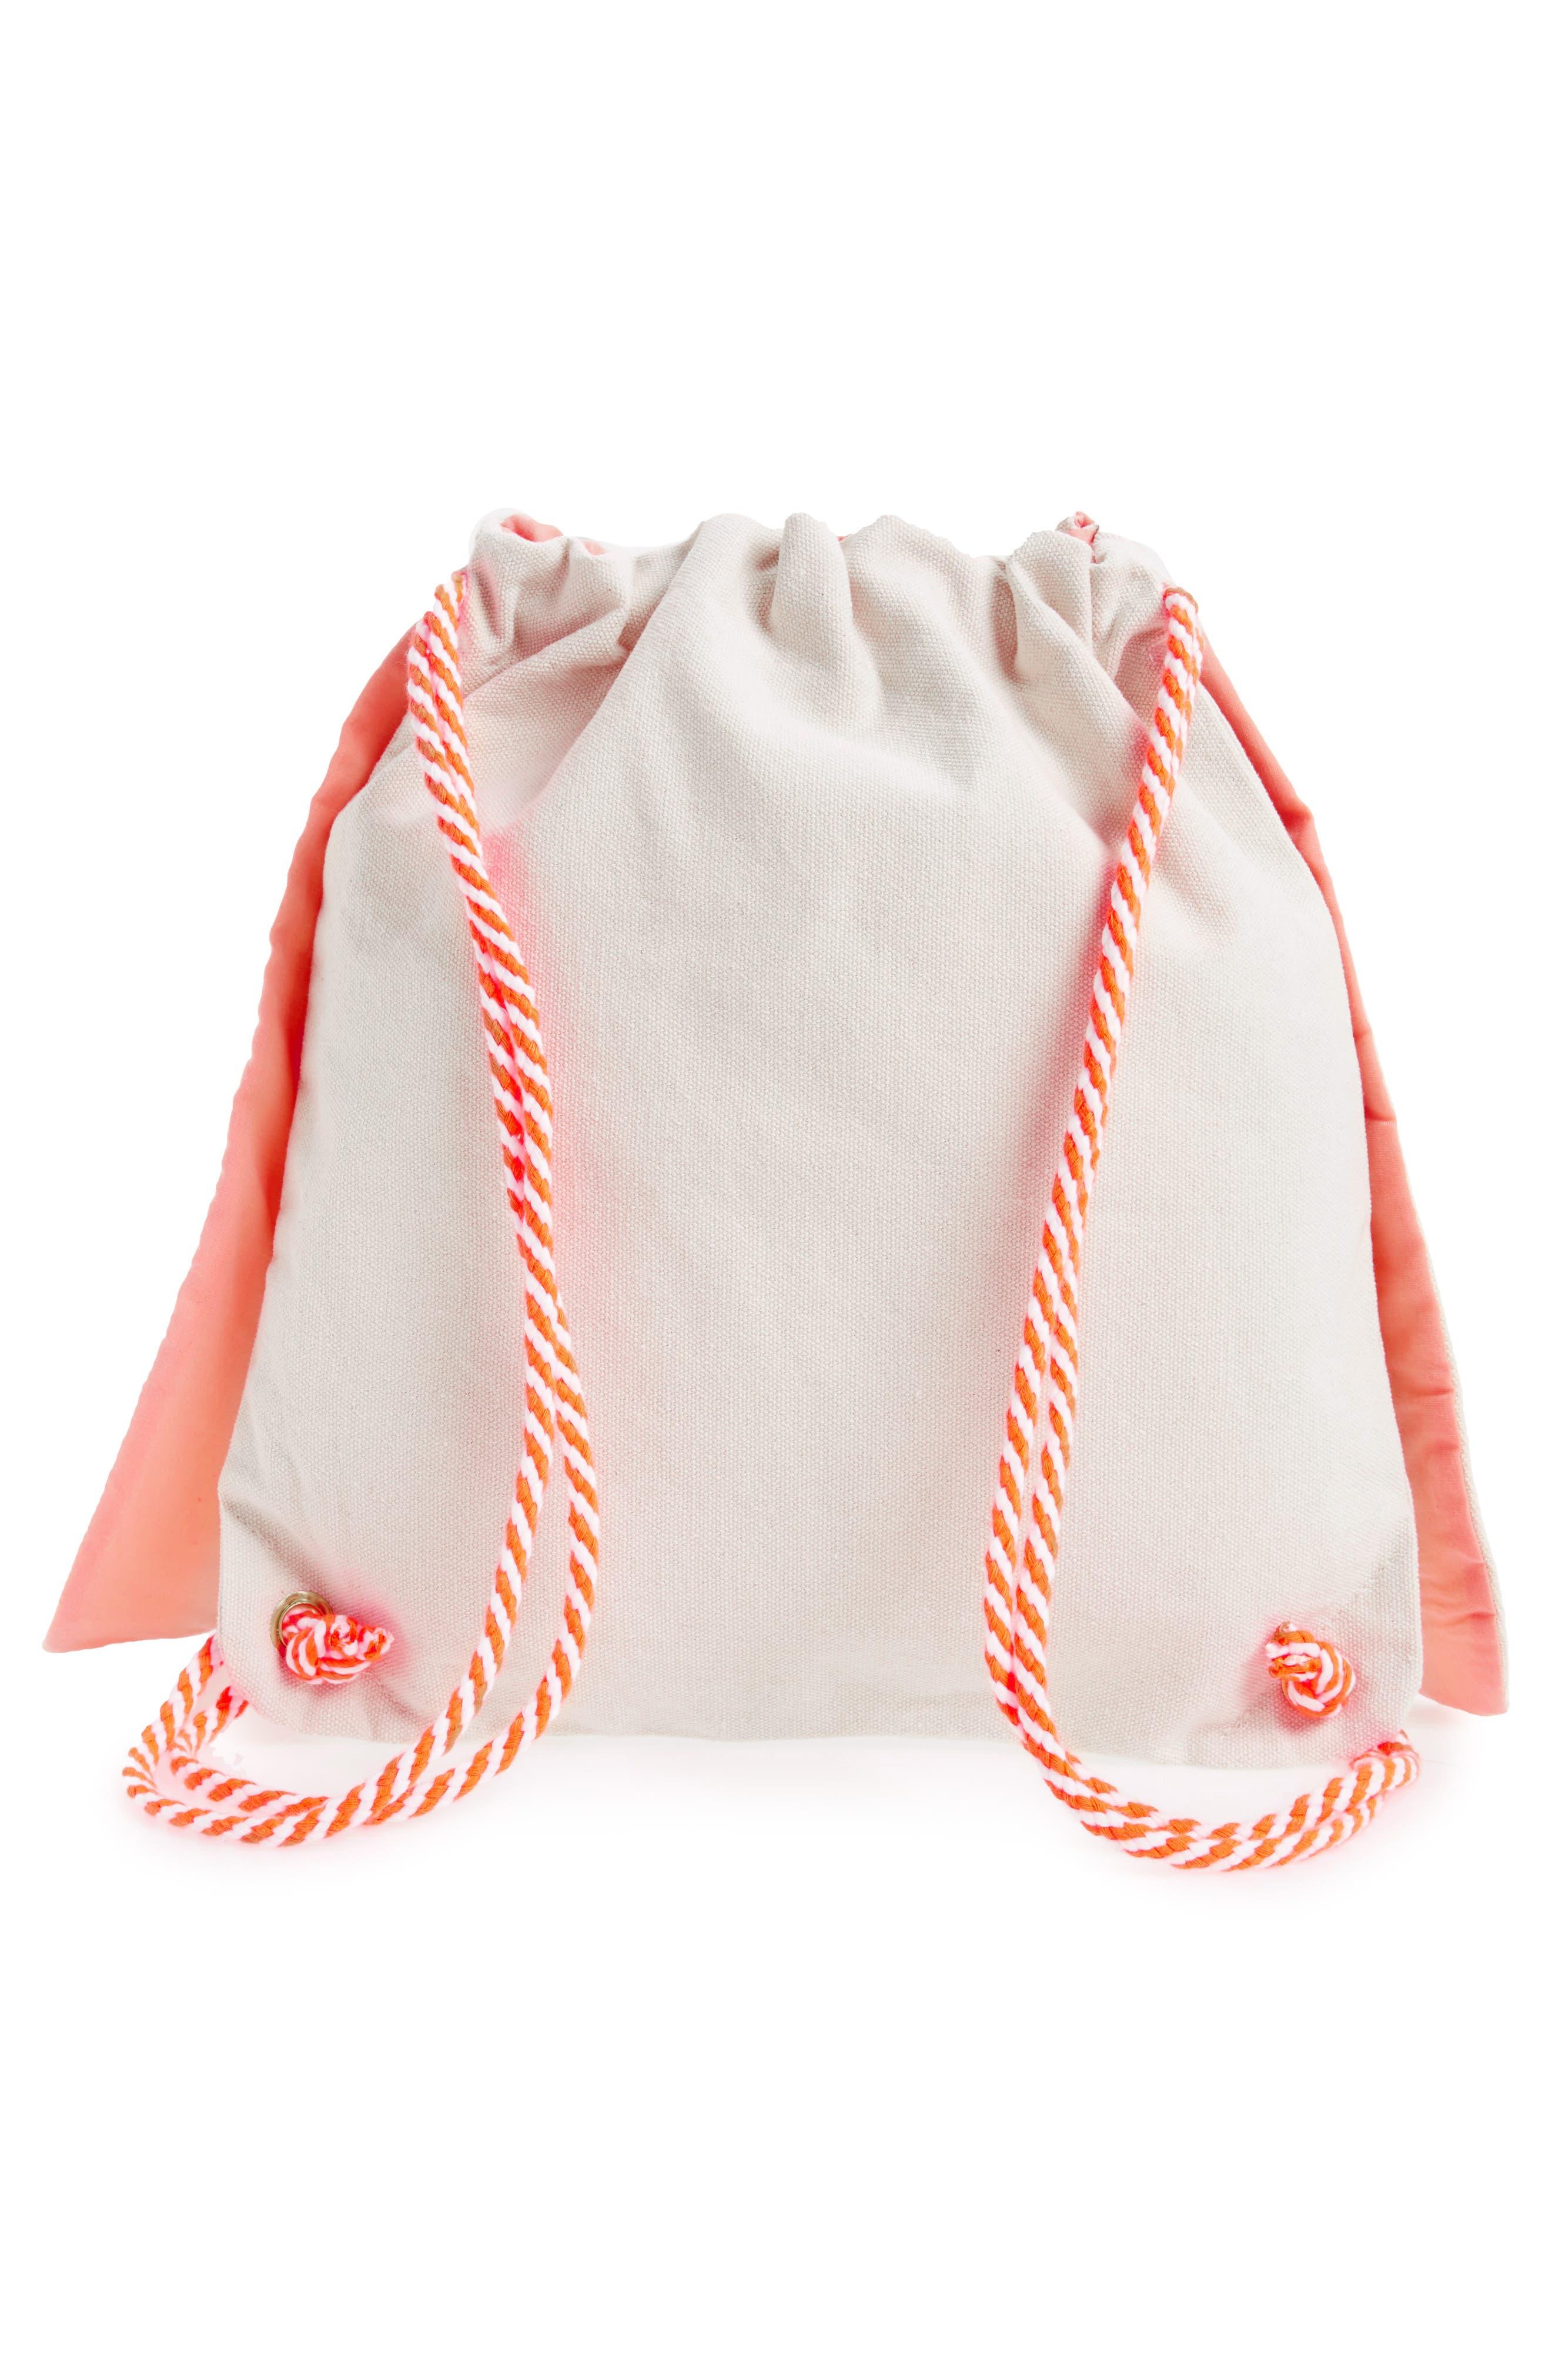 Alternate Image 3  - Meri Meri Bunny Backpack (Kids)